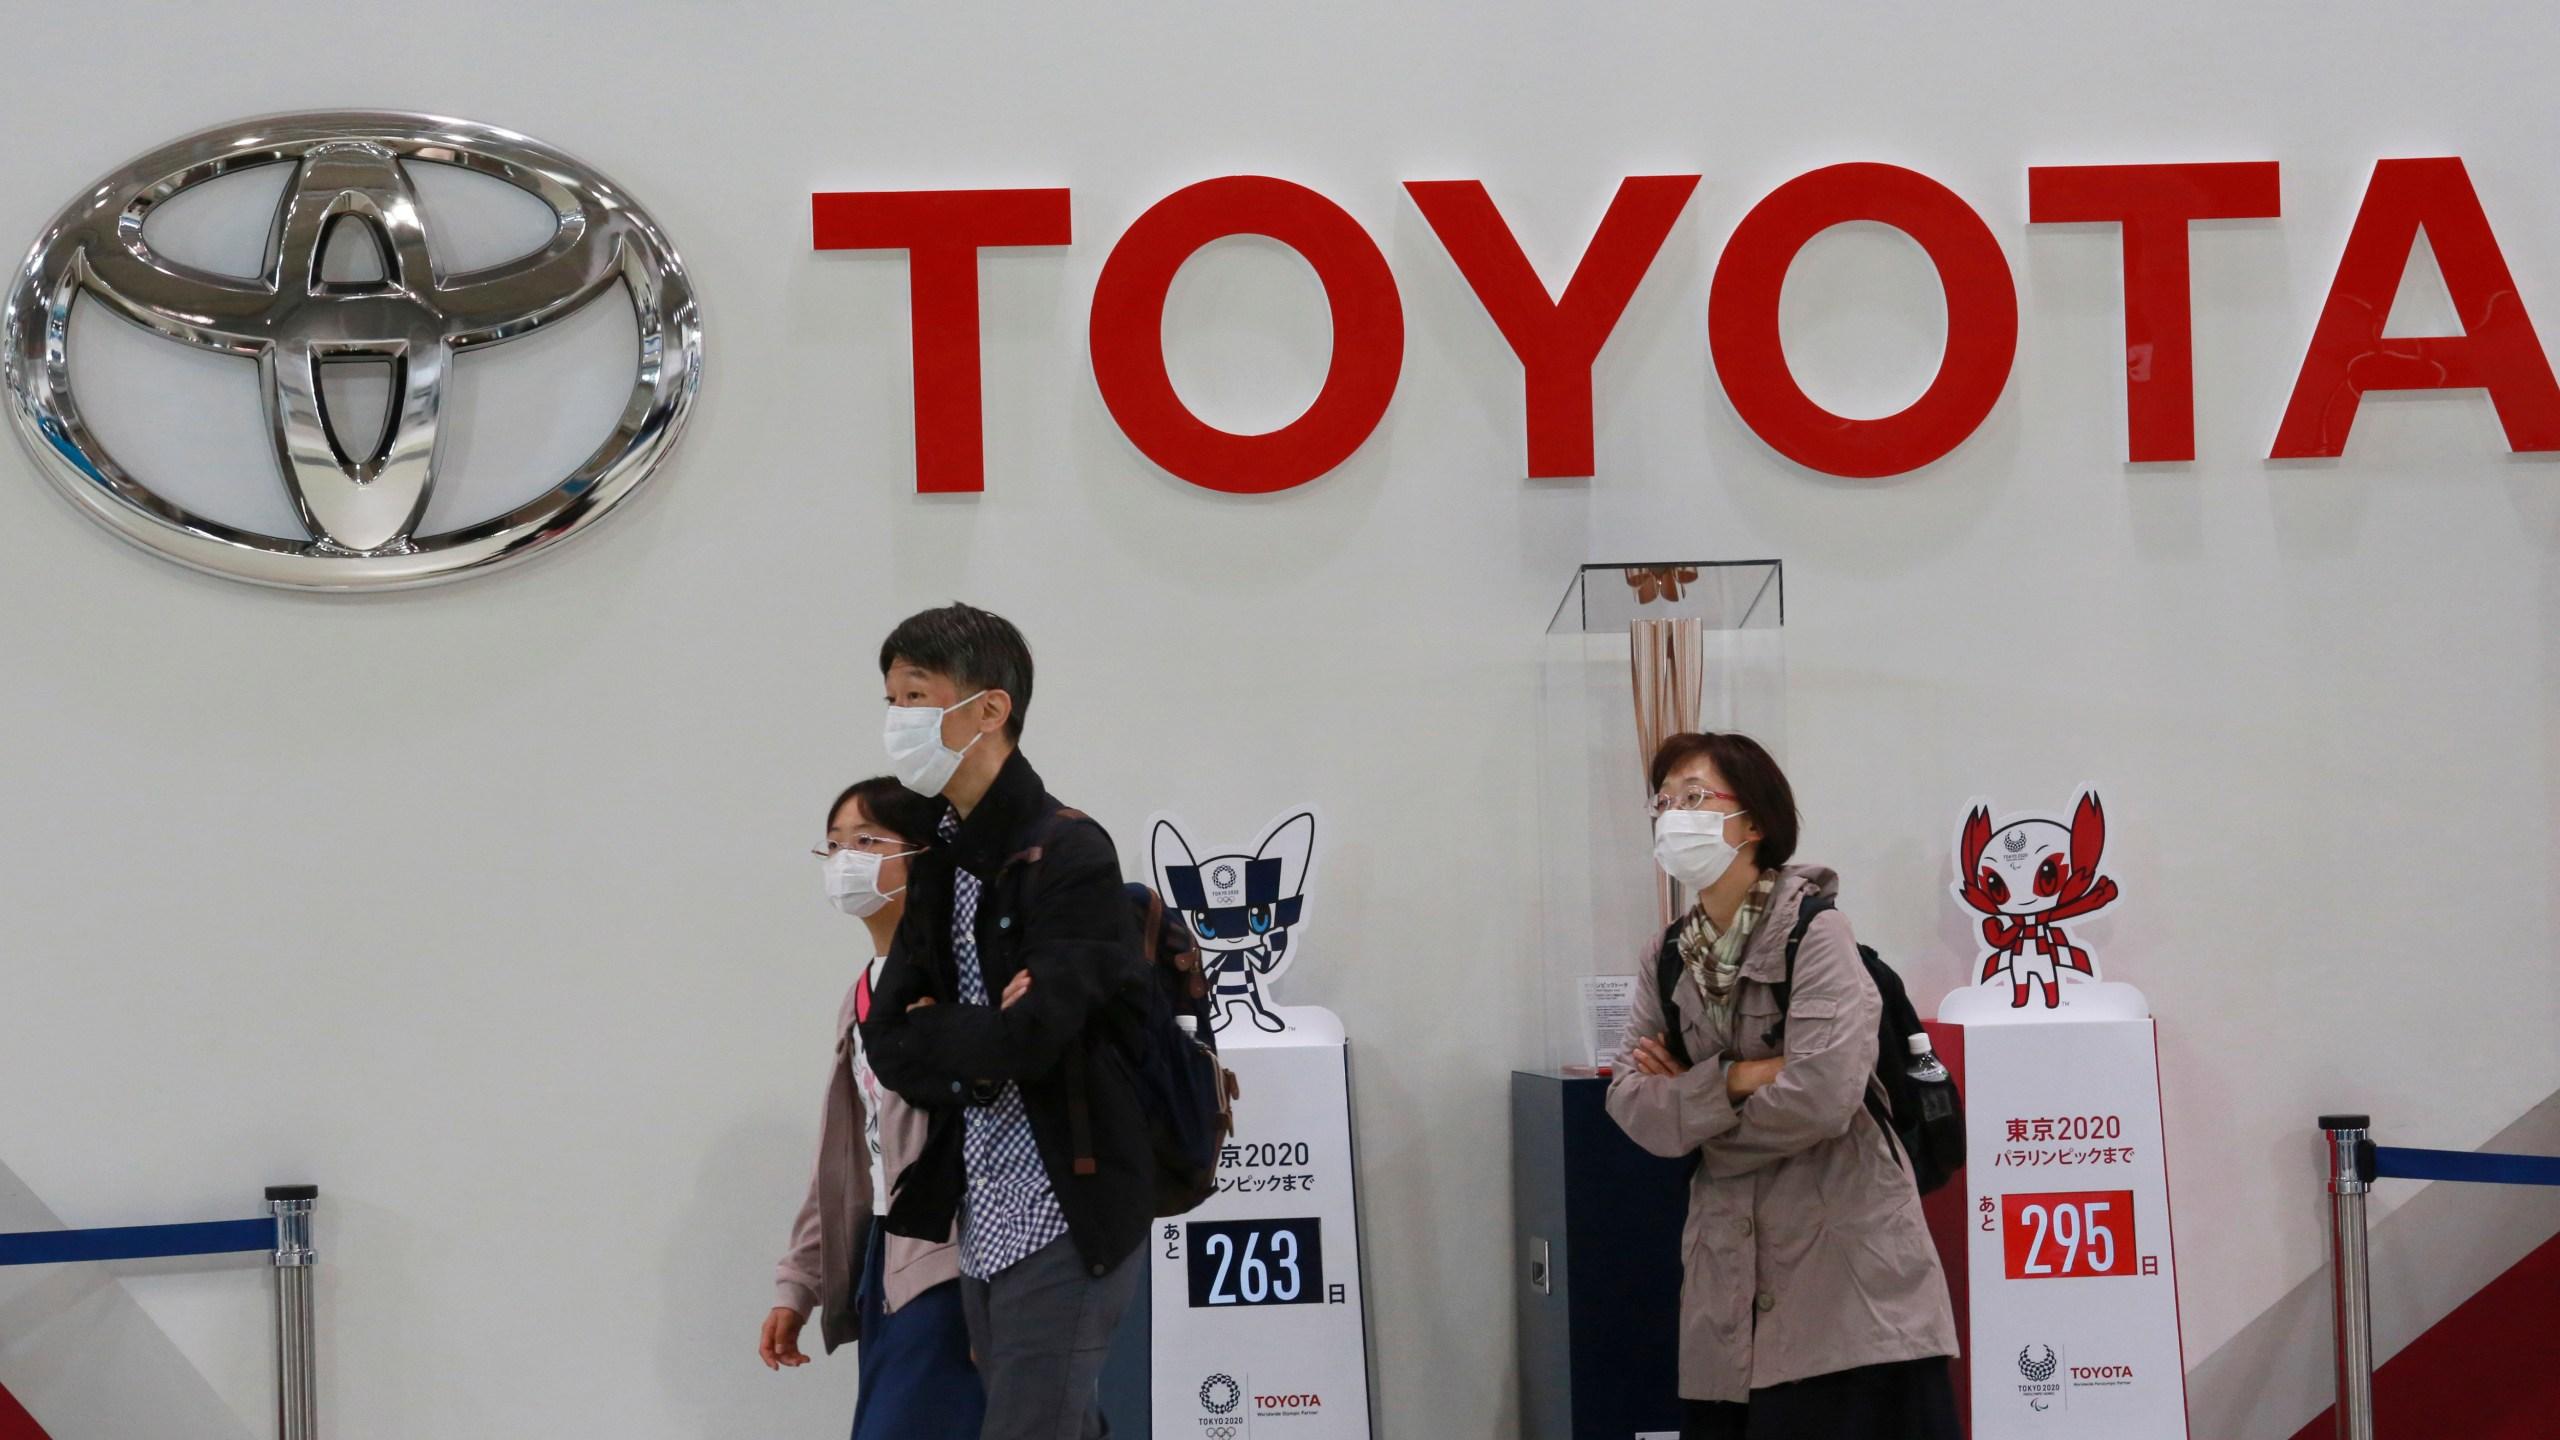 In this Nov. 2, 2020, file photo, visitors walk at a Toyota showroom in Tokyo. (AP Photo/Koji Sasahara, File)